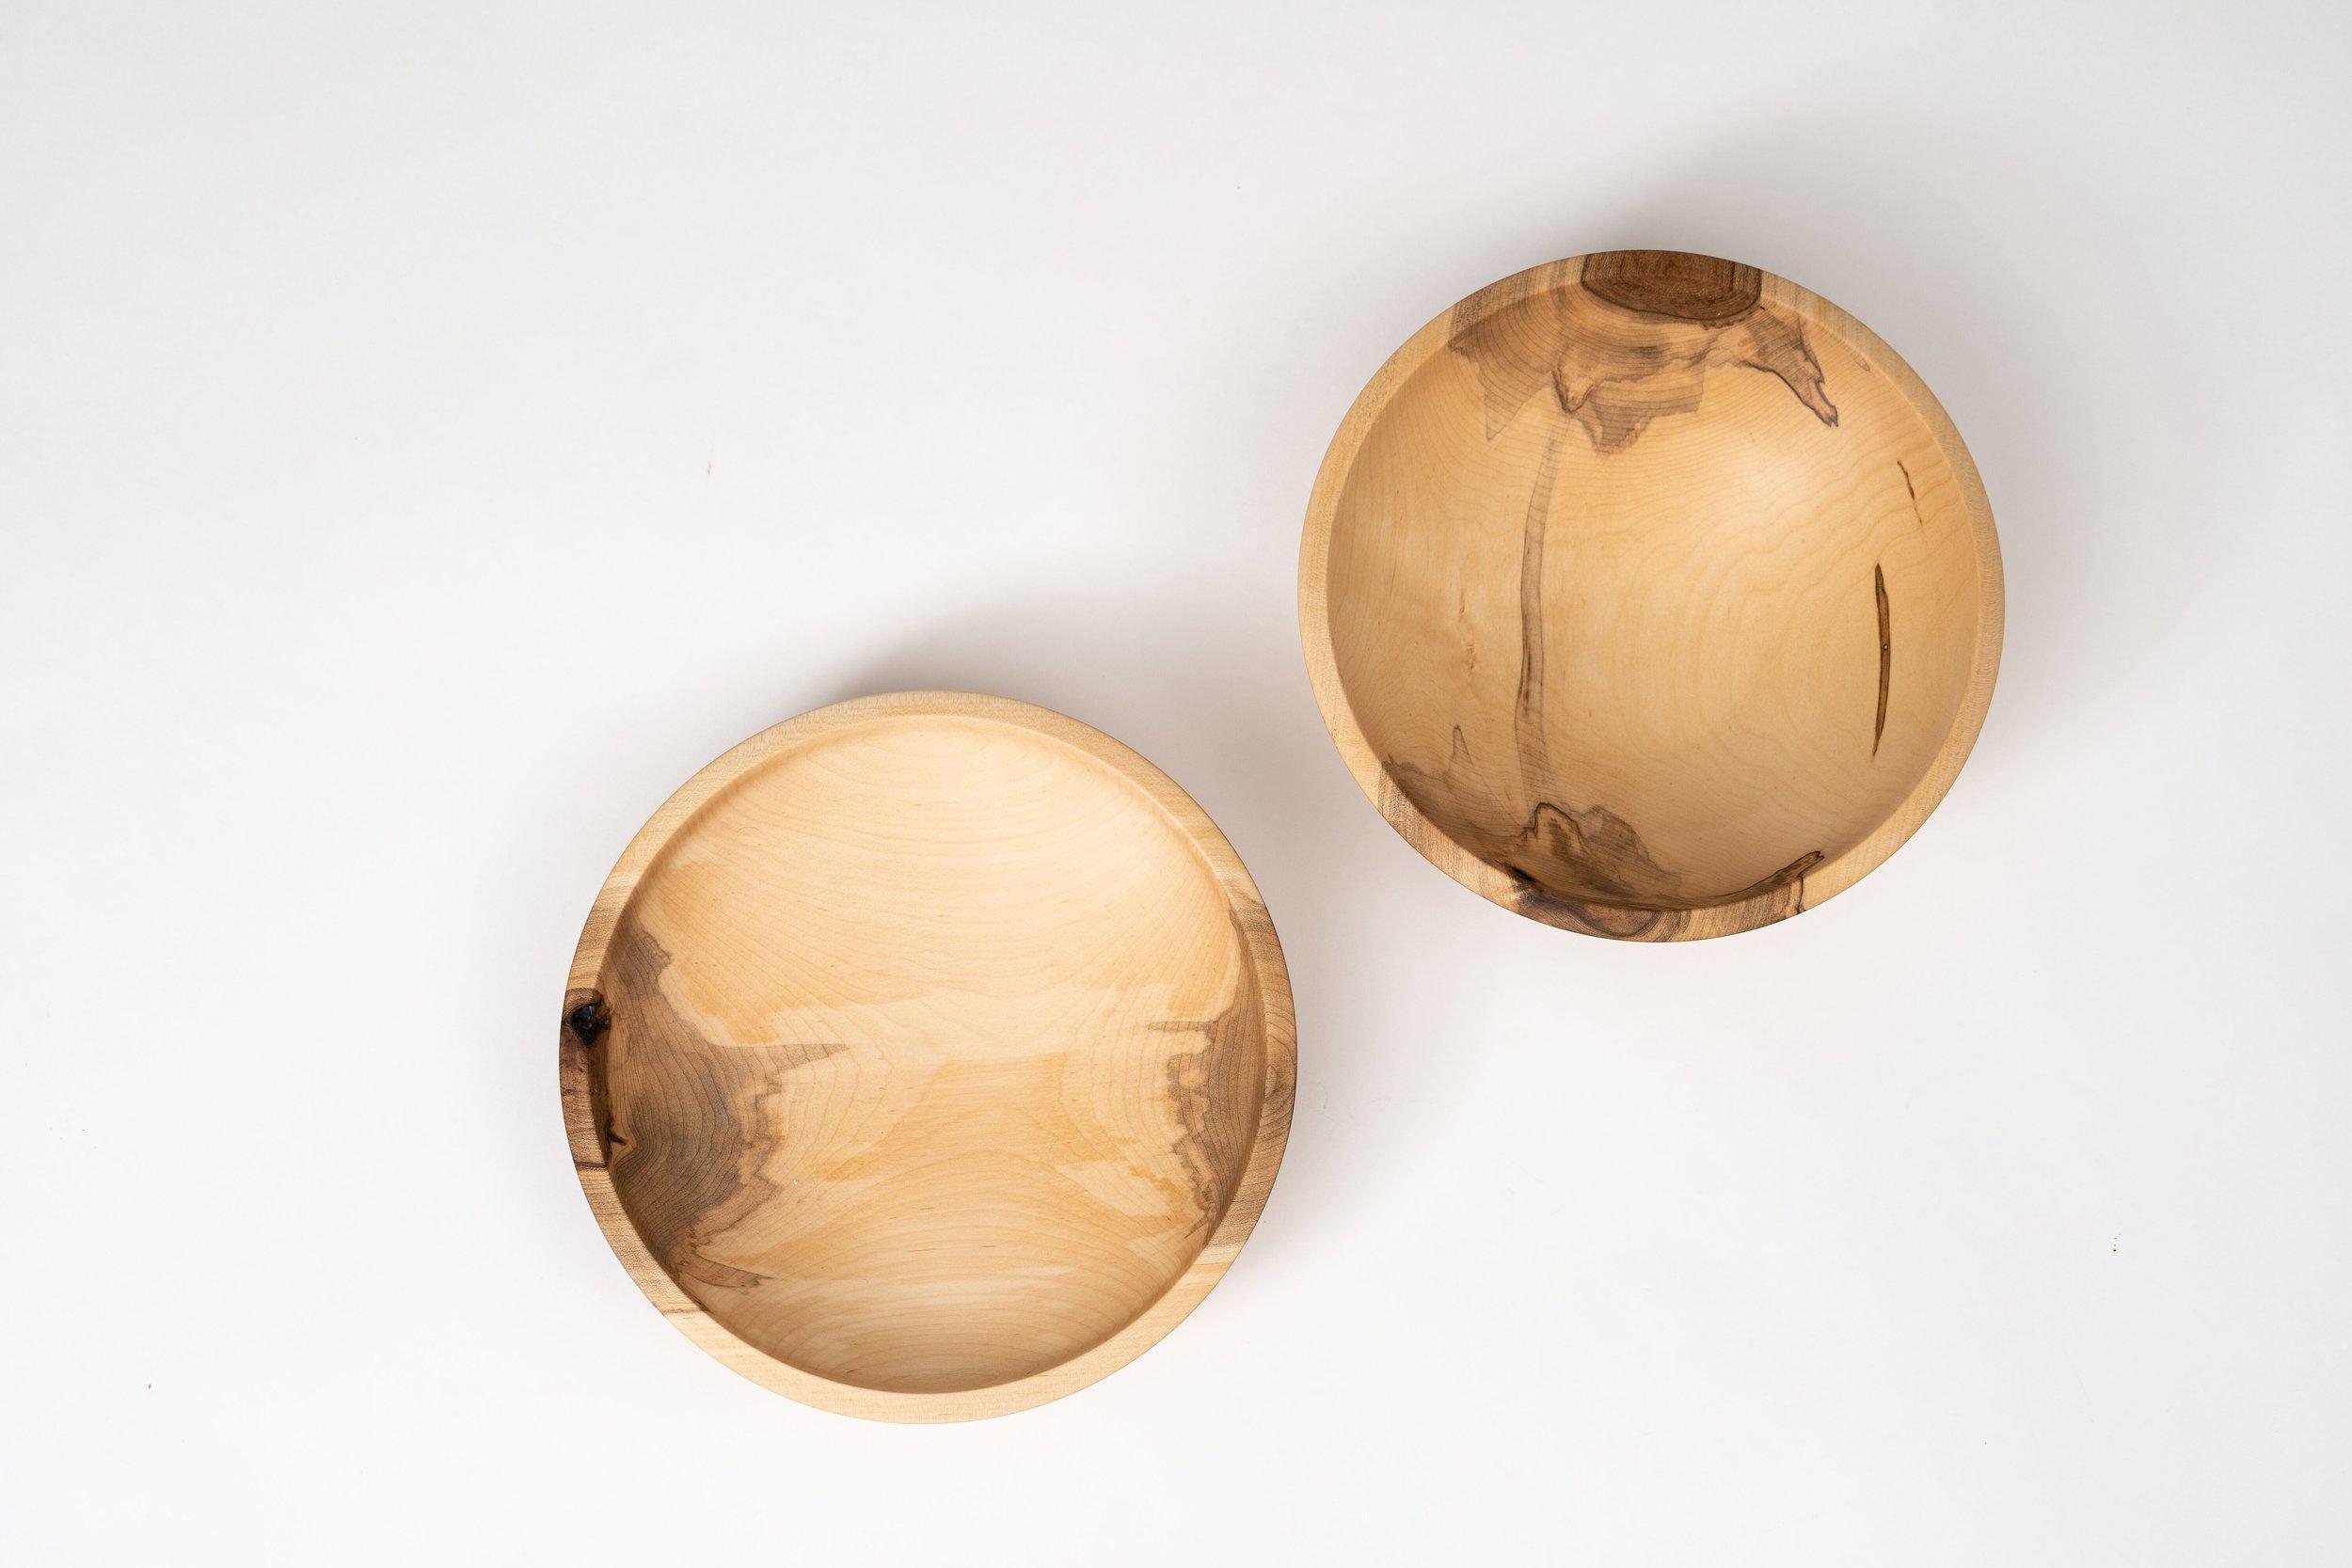 ambrosia-maple-wooden-bowls-handmade-dean-babin.jpeg